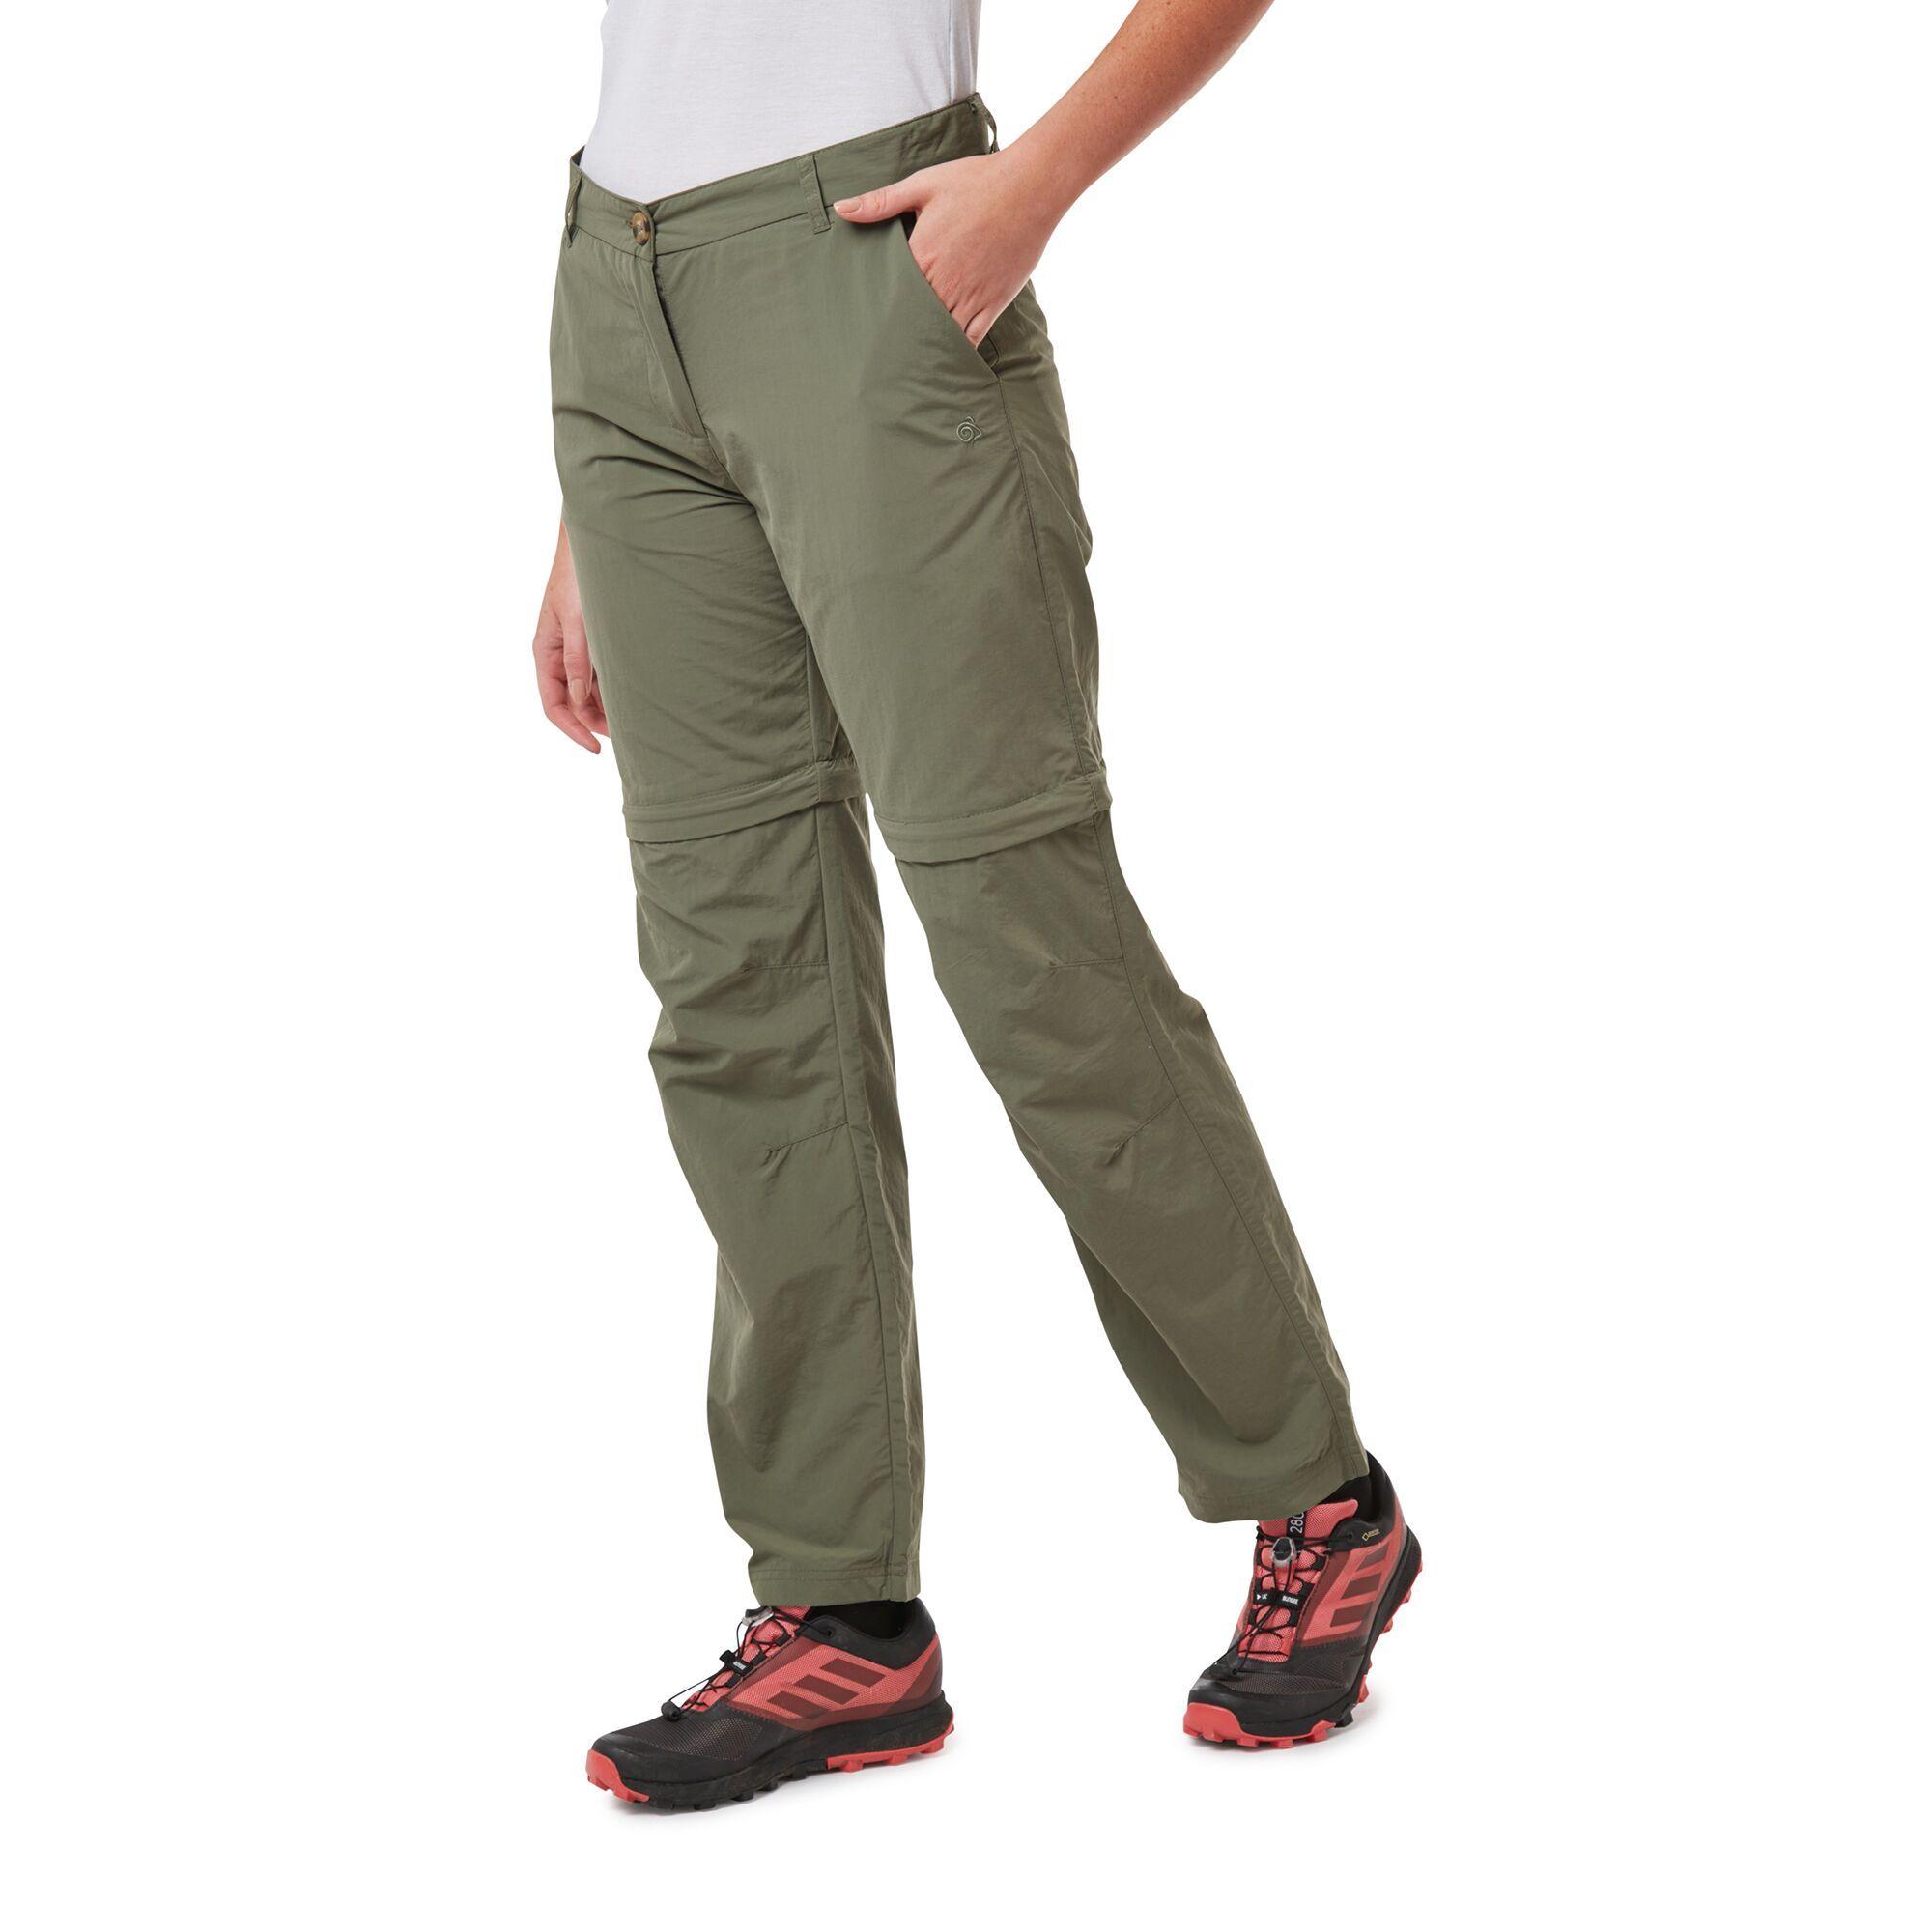 Craghoppers-Pantalon-CONVERTIBLE-Femme-CG1098 miniature 7